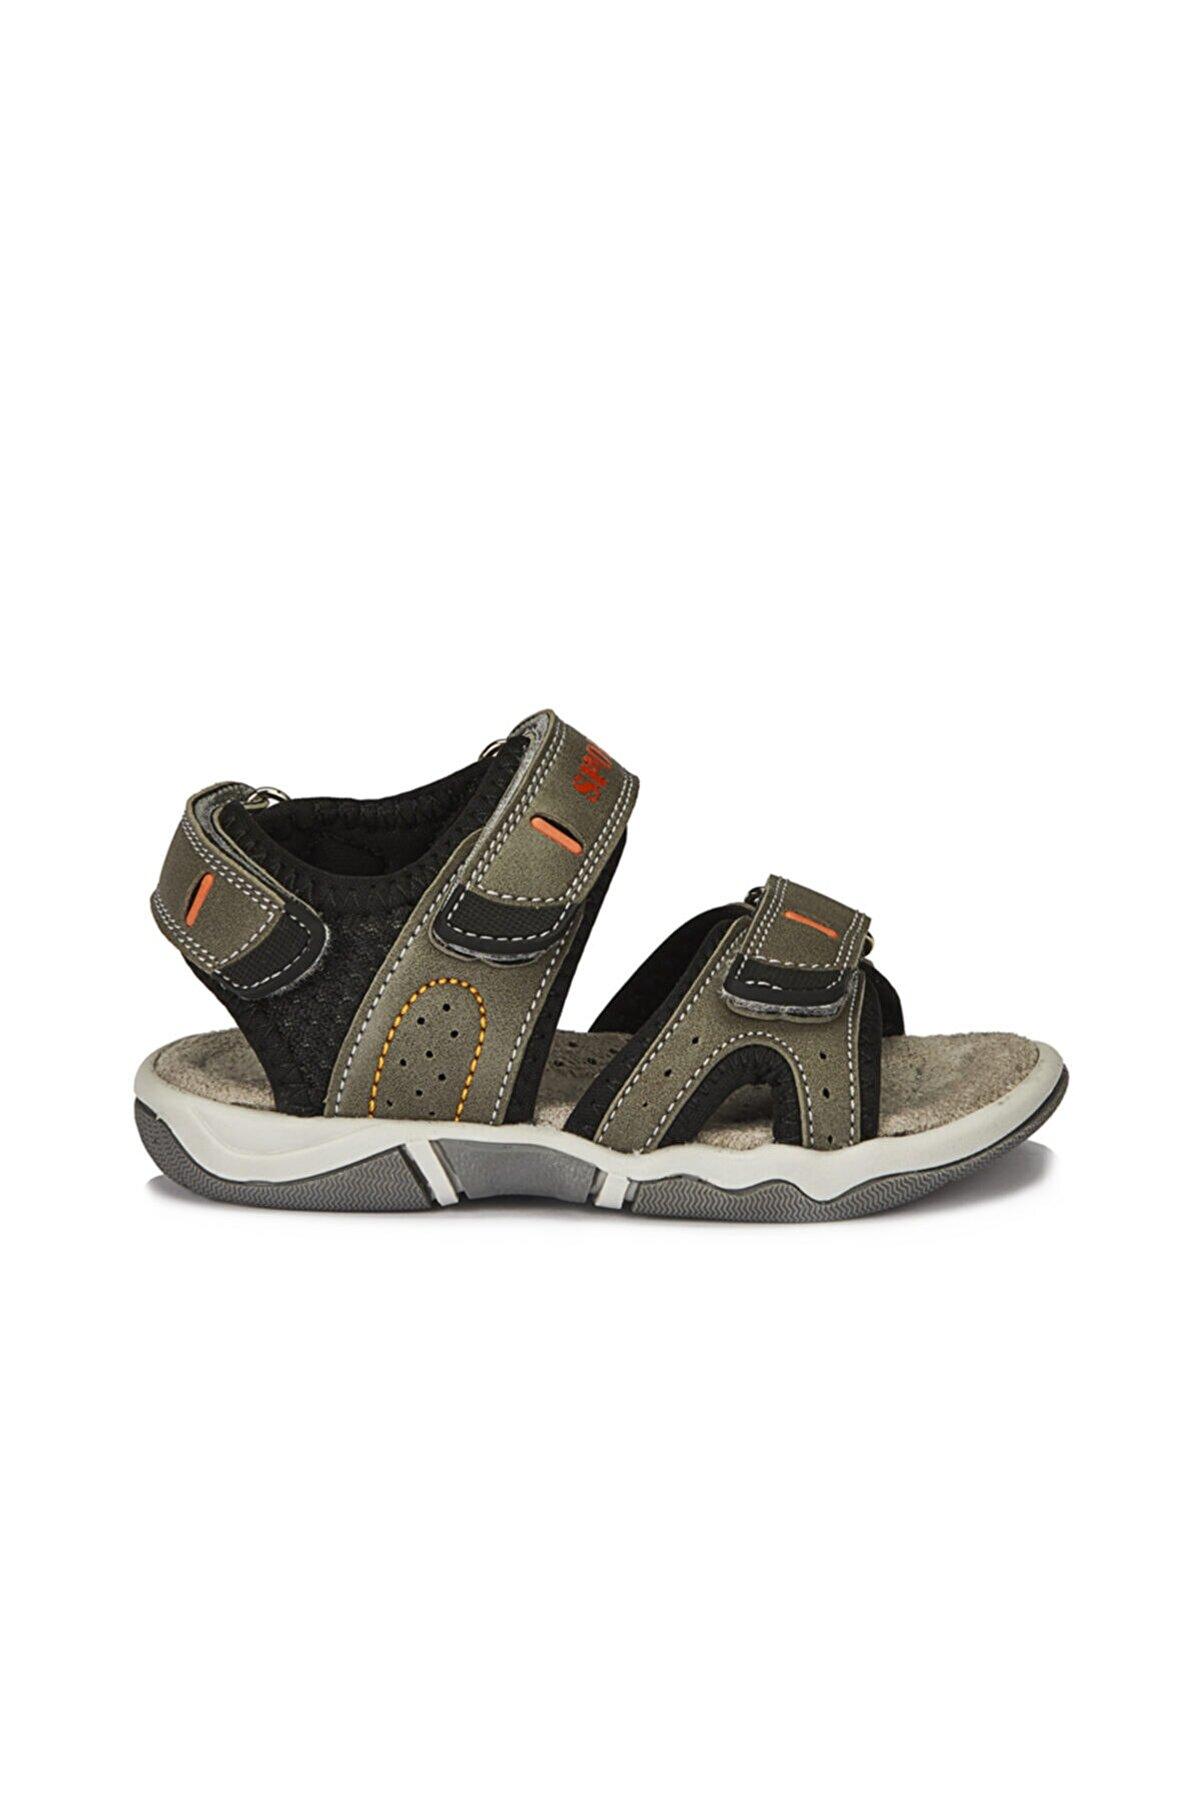 Vicco Füme Sandalet